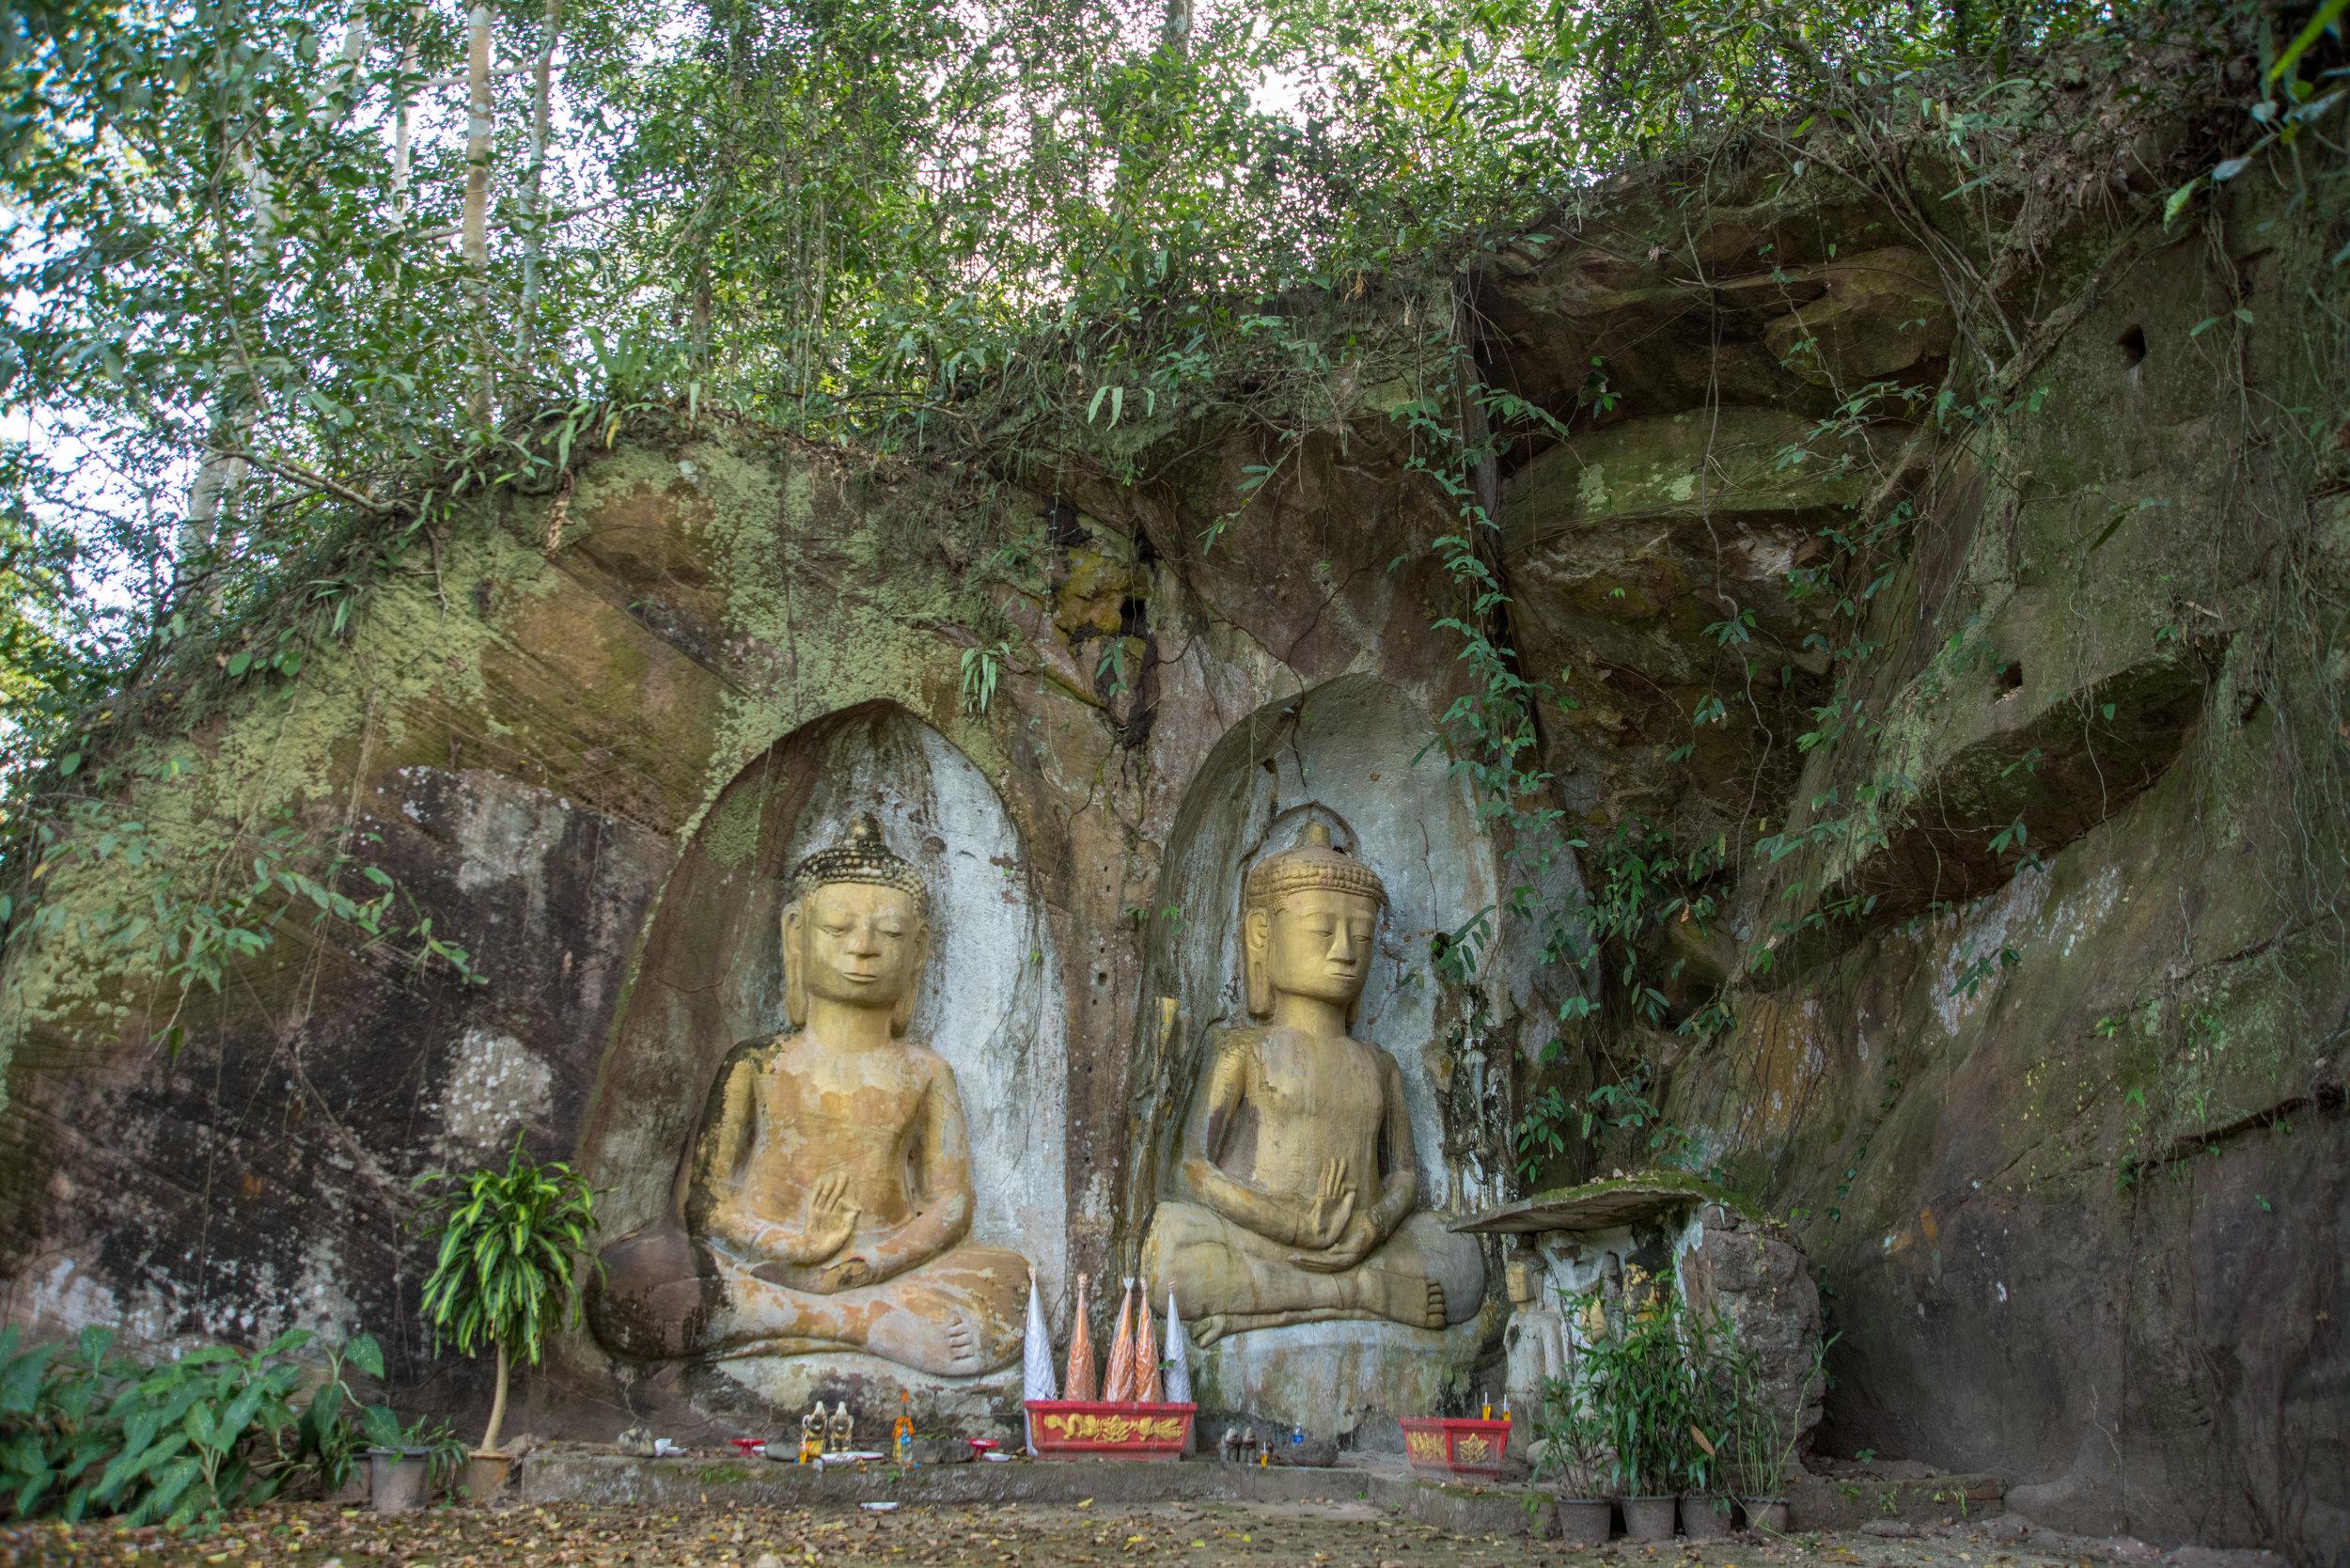 Buddhas, archaeological site at Vang Xang, Laos